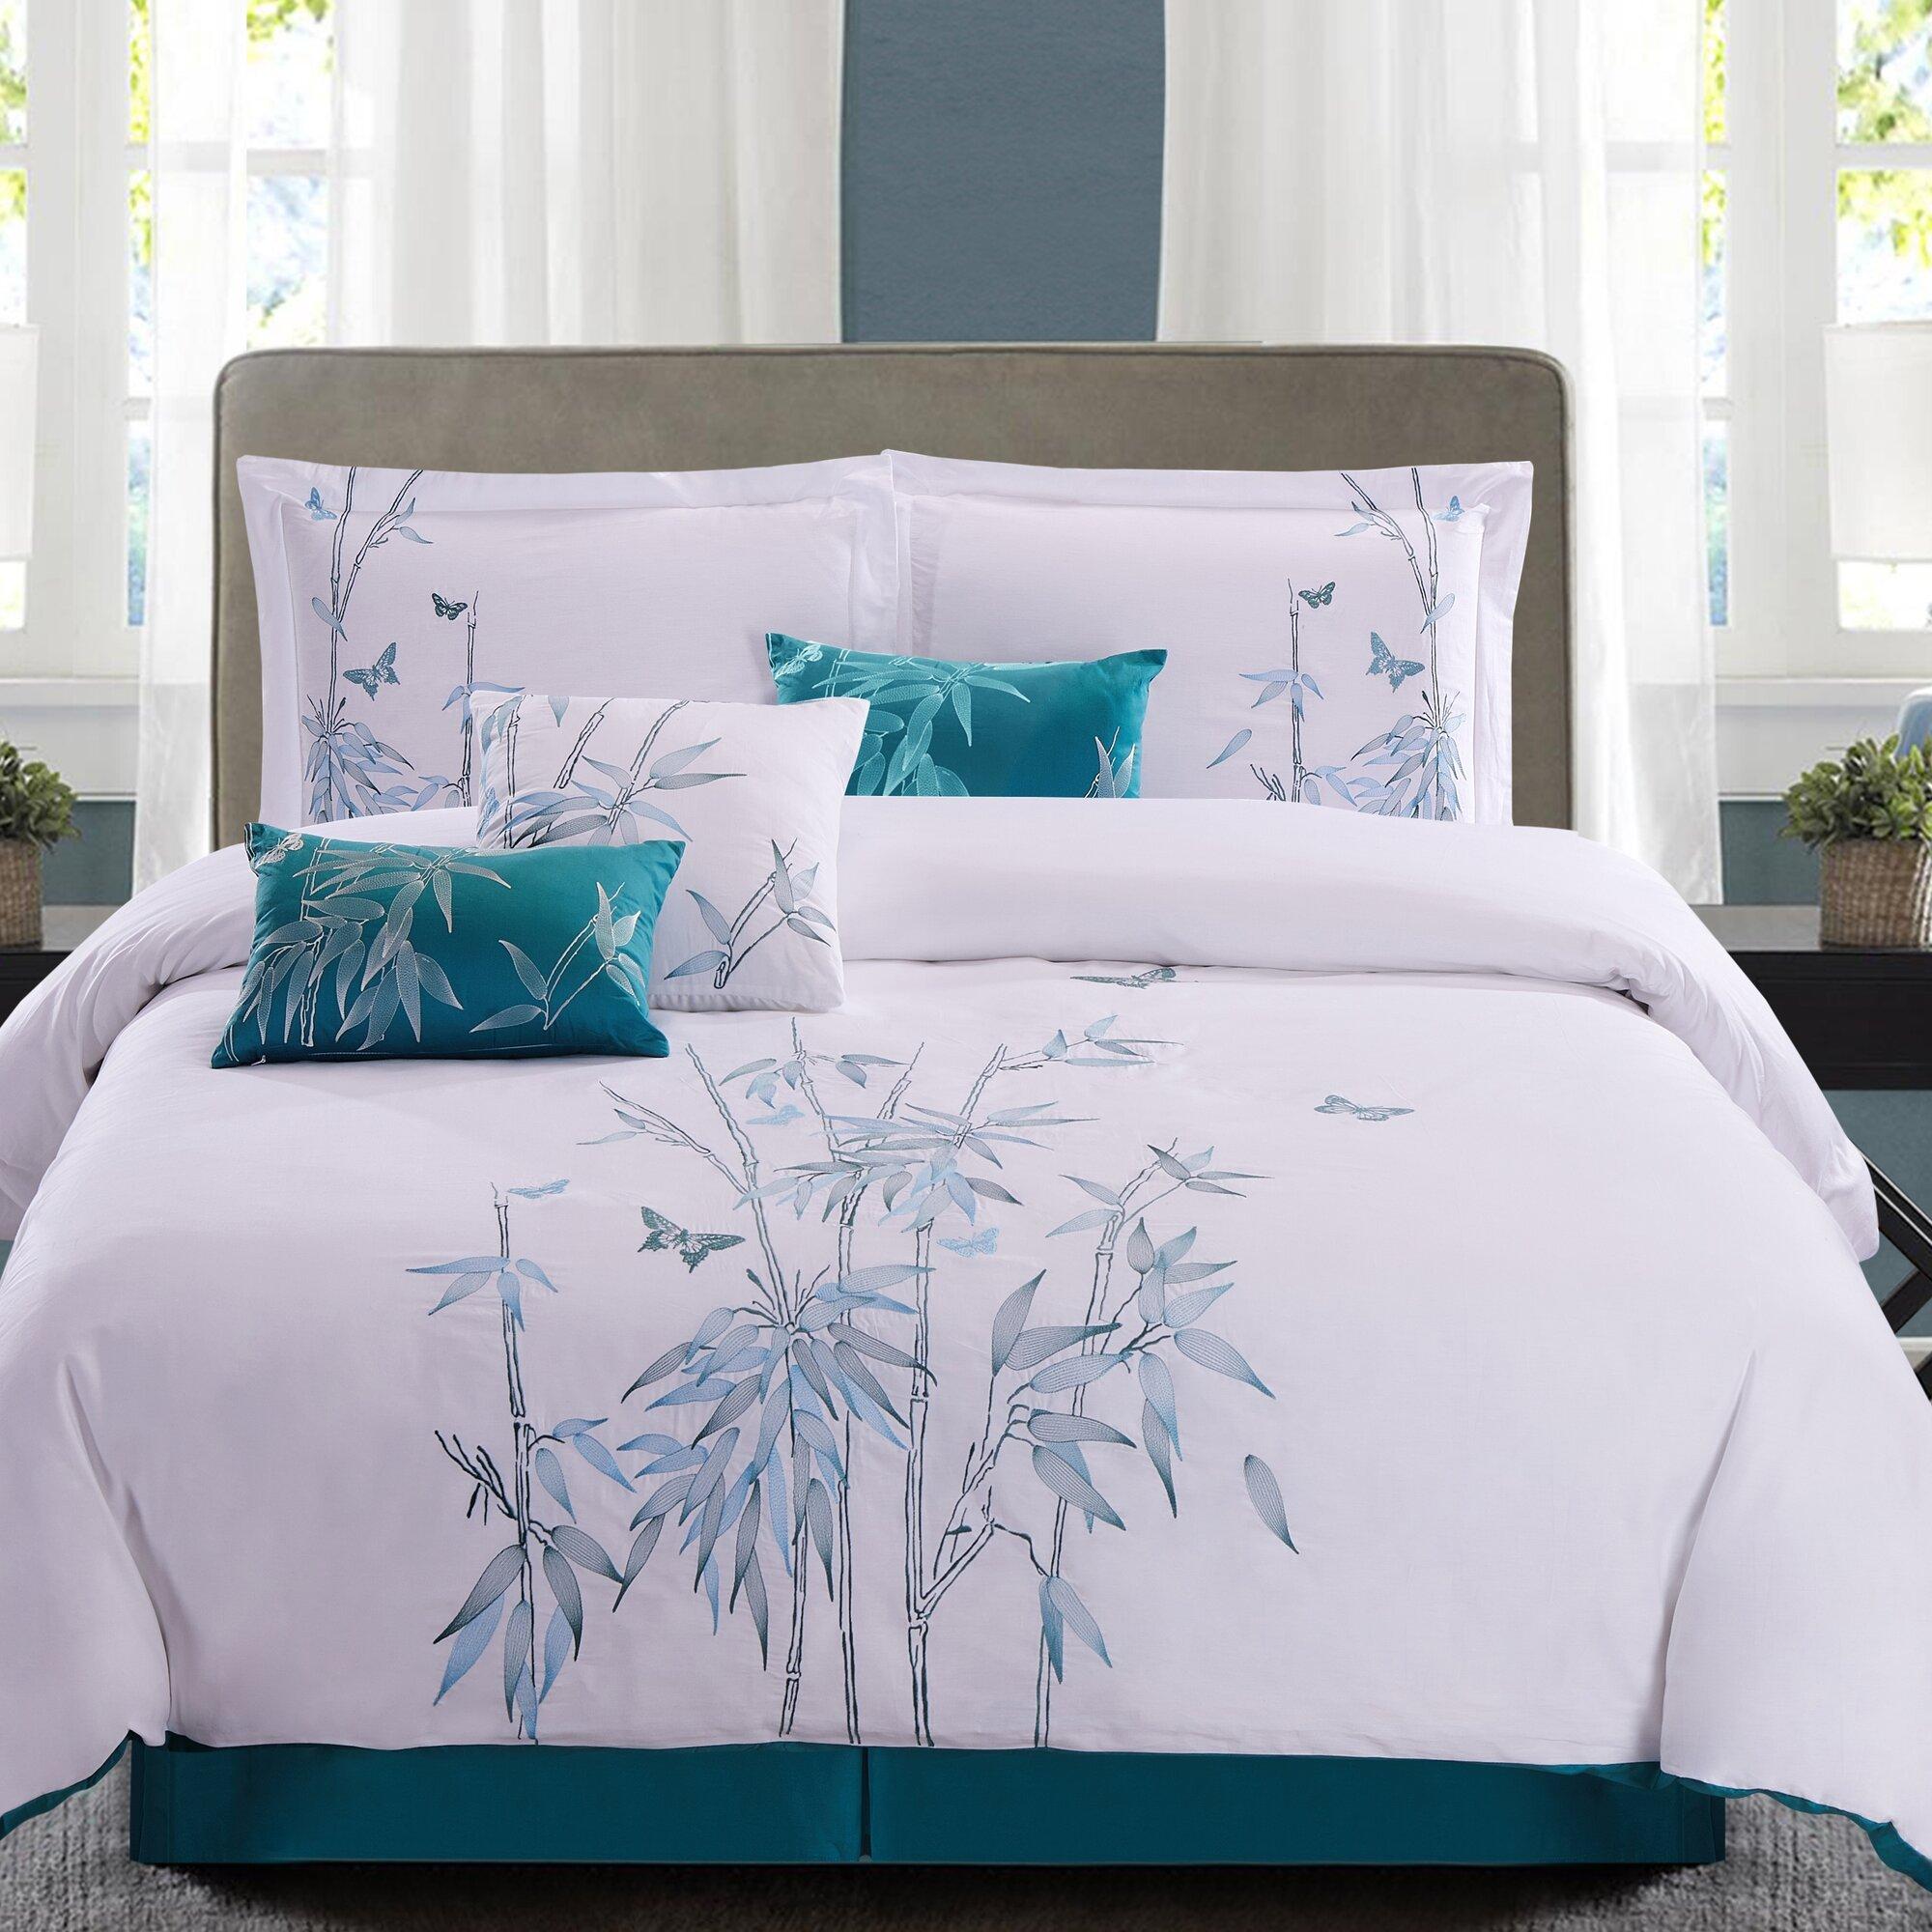 panama jack 7 piece comforter set reviews wayfair. Black Bedroom Furniture Sets. Home Design Ideas